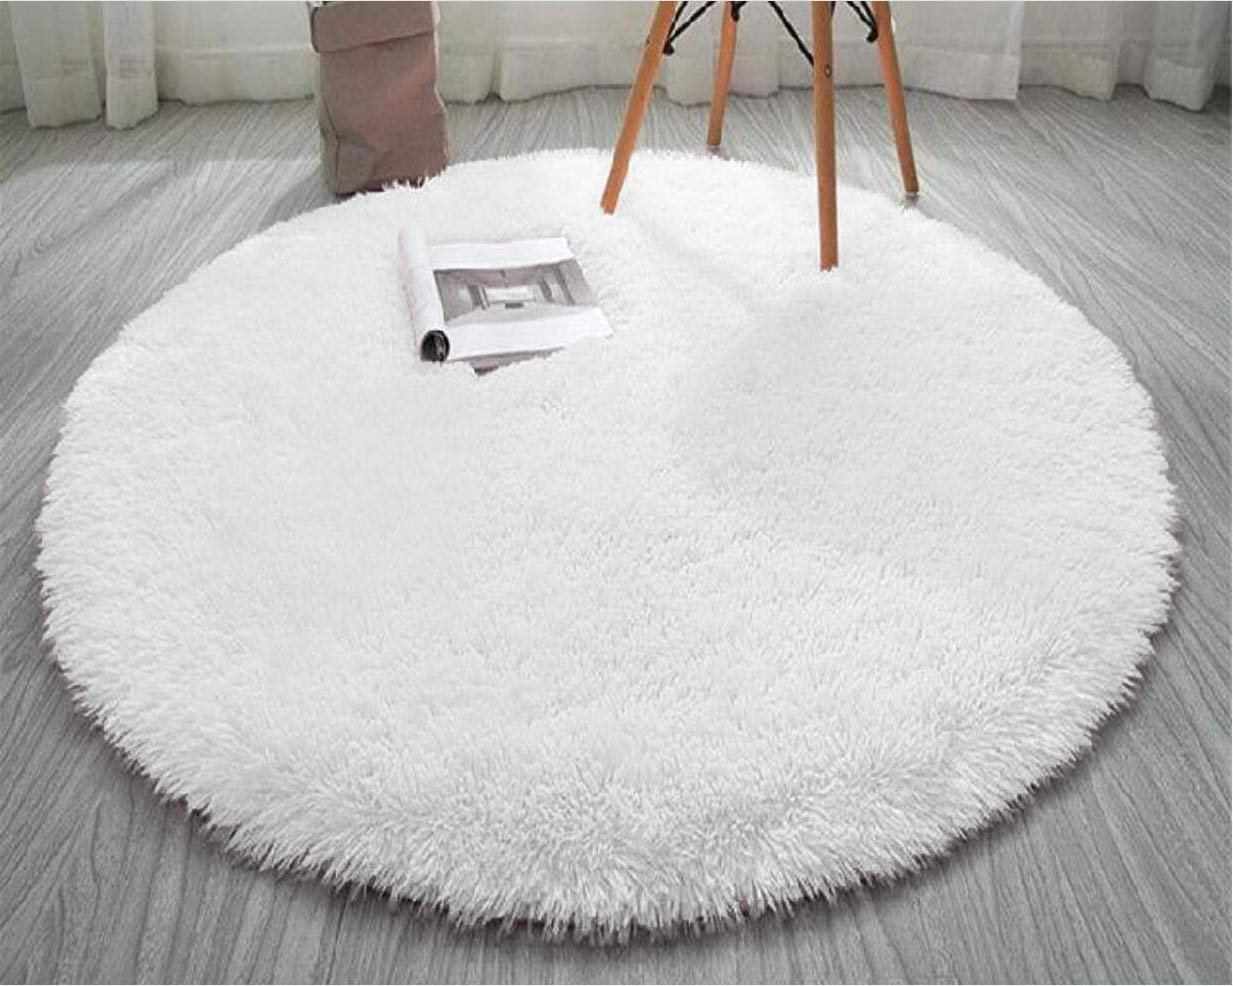 FlashLTD Fluffy Ultra Soft Shaggy Area Rugs for Bedroom Fluffy Carpet for Kids Room Bedside Nursery Mats White, 4 X 4